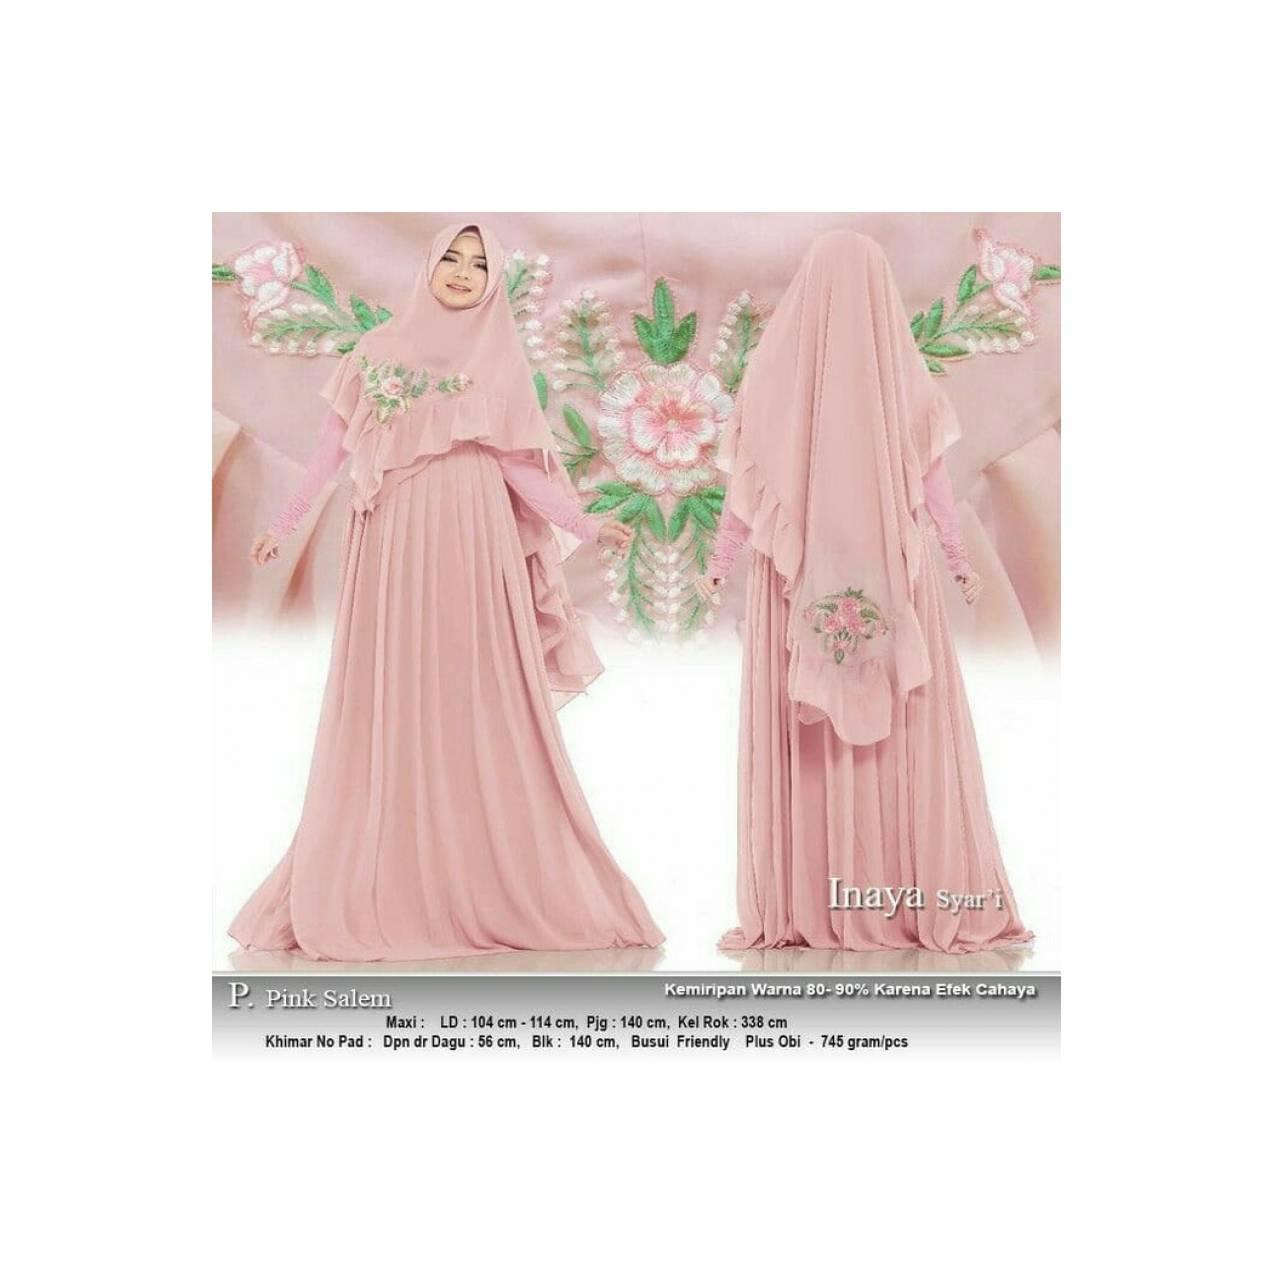 Baju Busana Muslim Gamis Maxy Wanita/Pakaian Maxy Bordir Inaya Pink